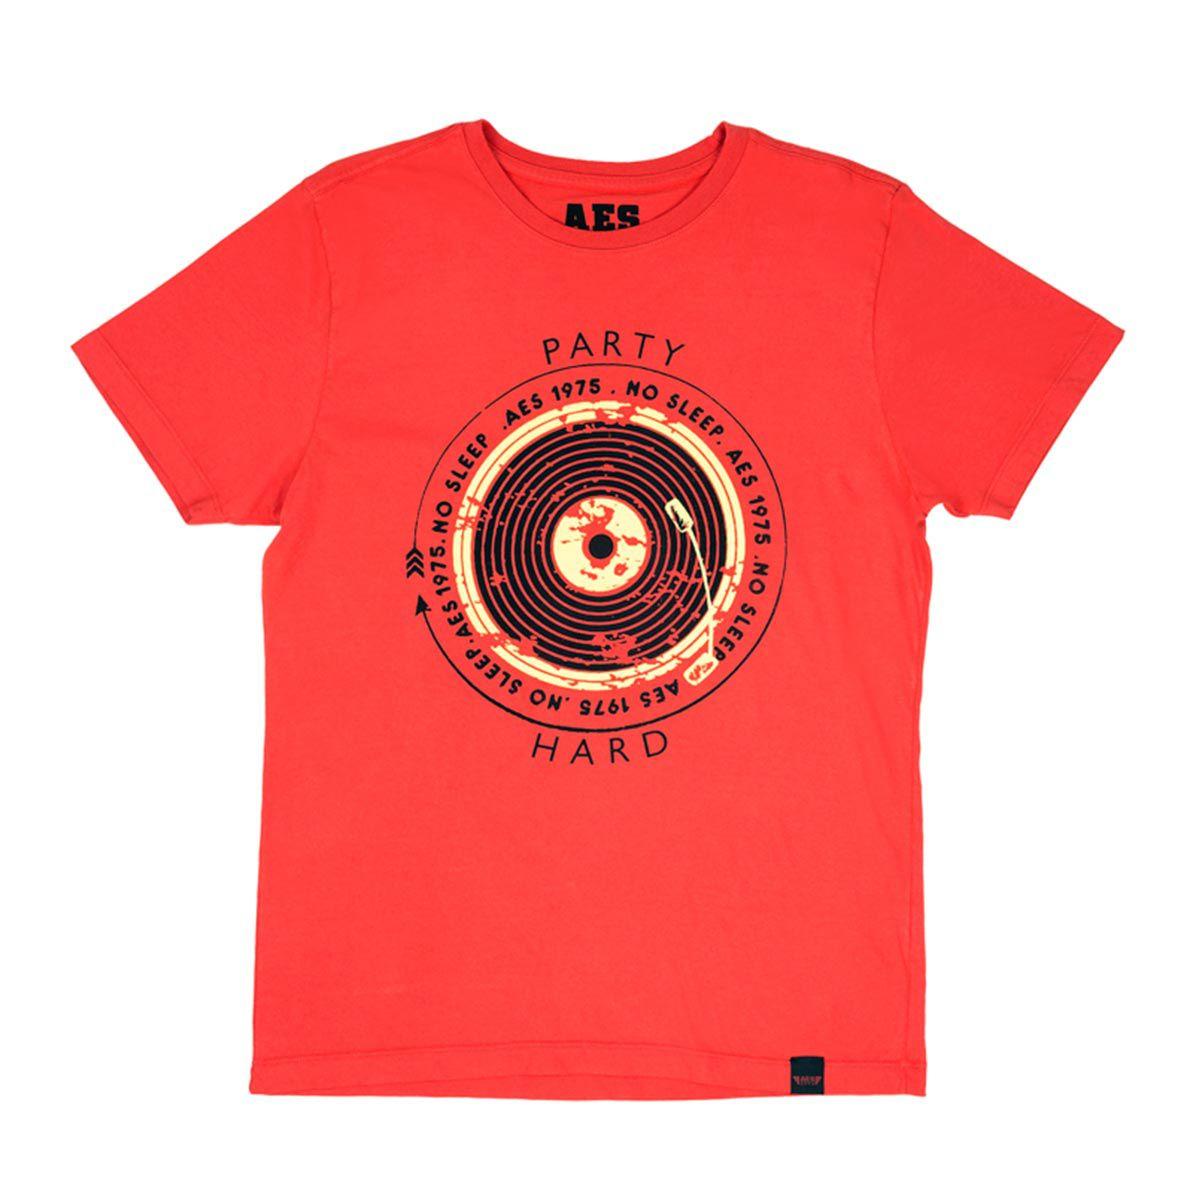 Camiseta AES 1975 Party Hard